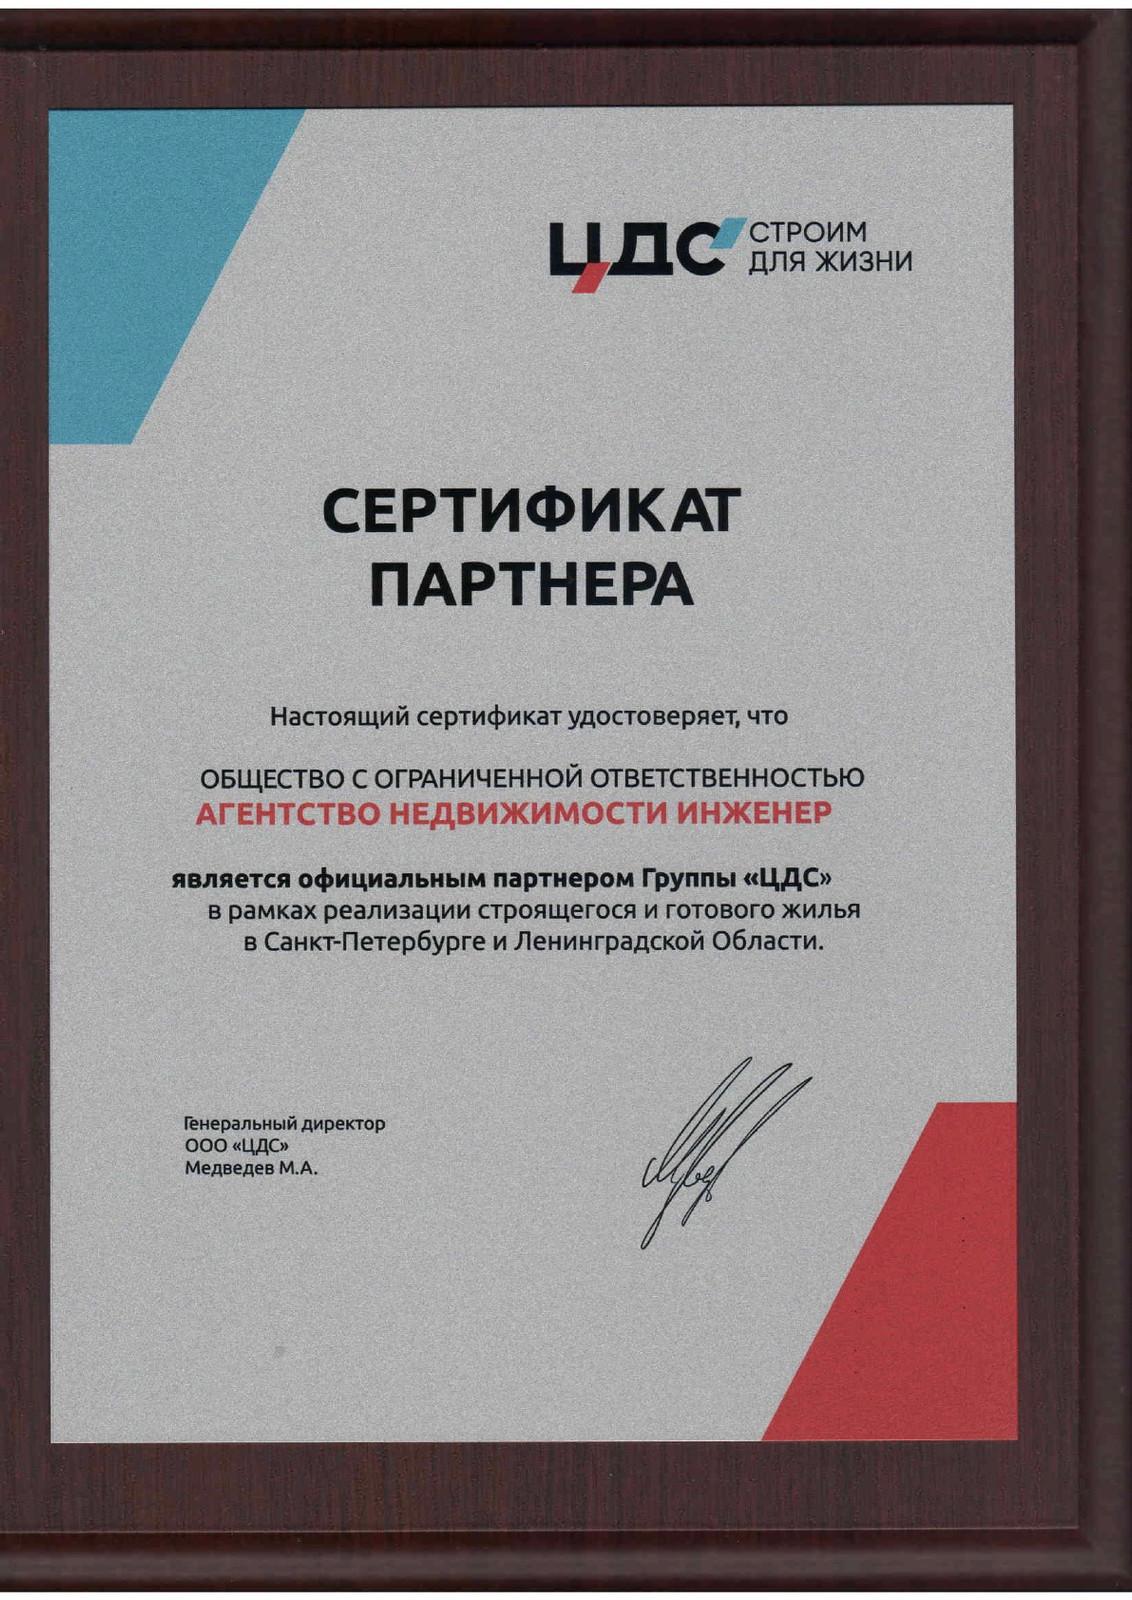 2699a24f7bac1 ЛСР .jpg · ЛСР Москва.jpg · Серитификат ЛСР Екатеринбург.png · ЦДС.jpg